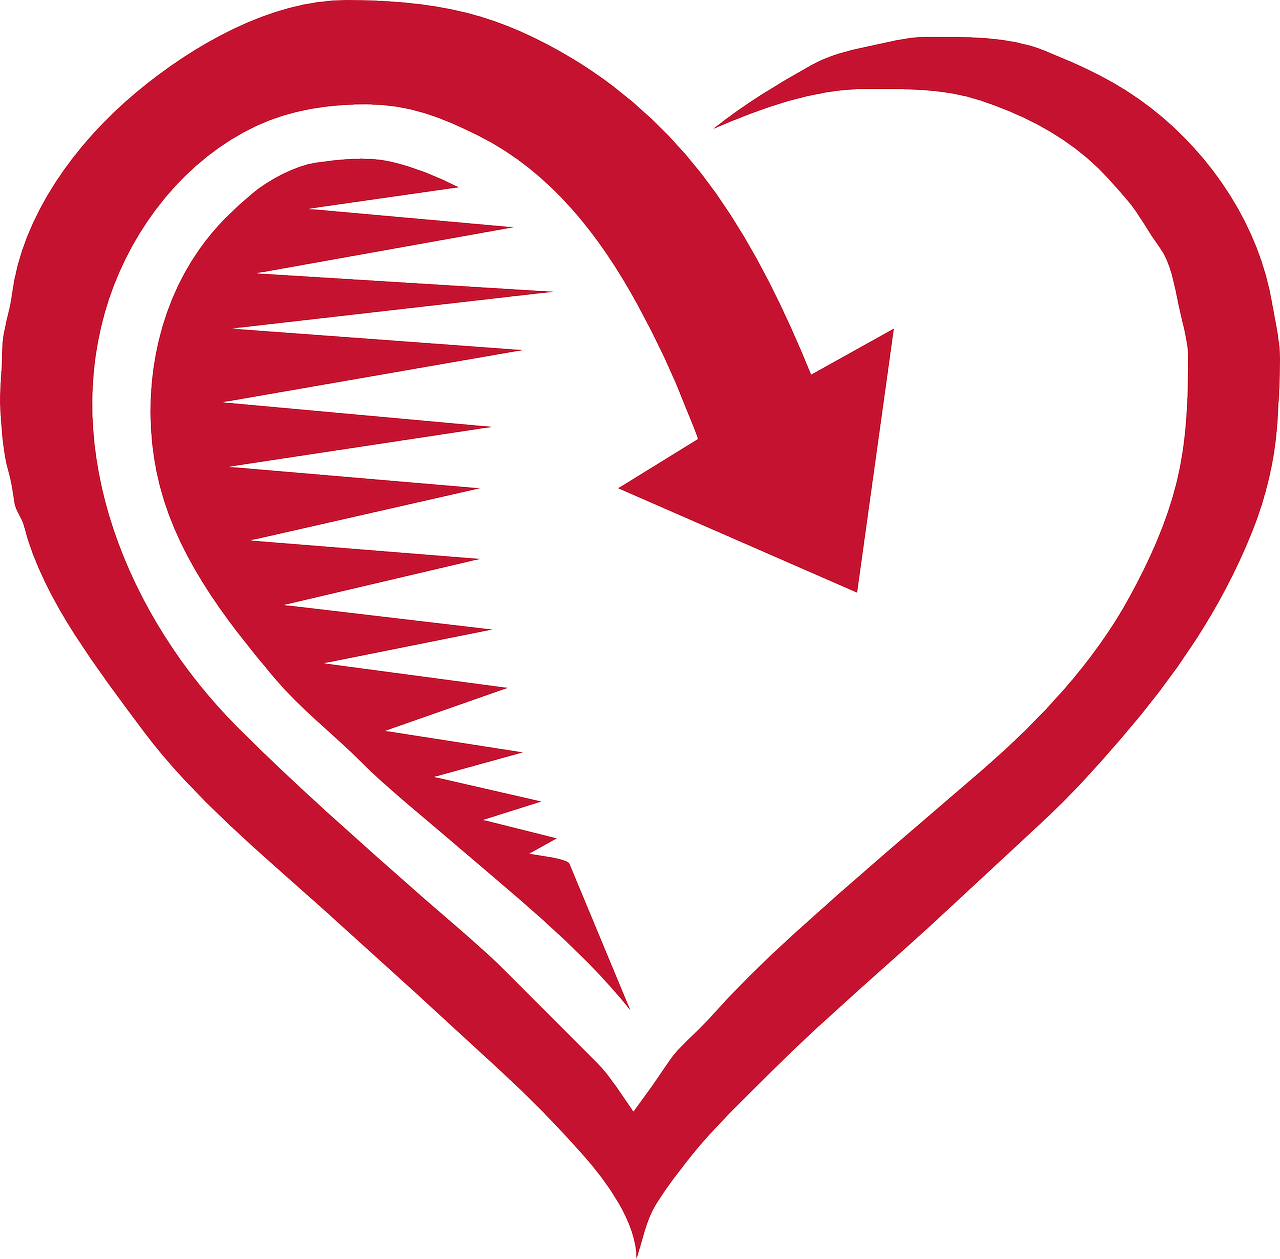 Displazia aritmogena de ventricul drept